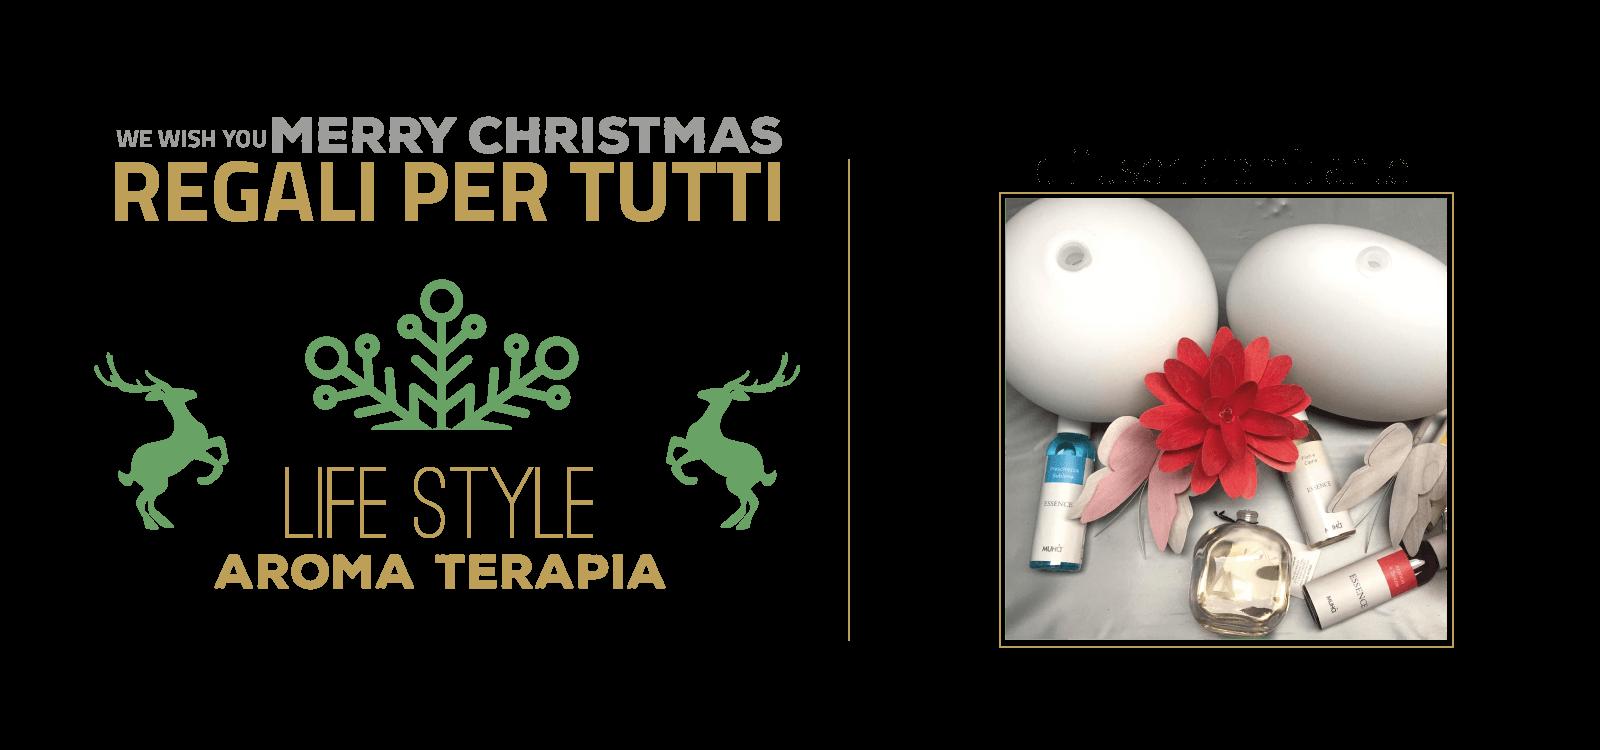 8_slide-show-regali-Natale-2018